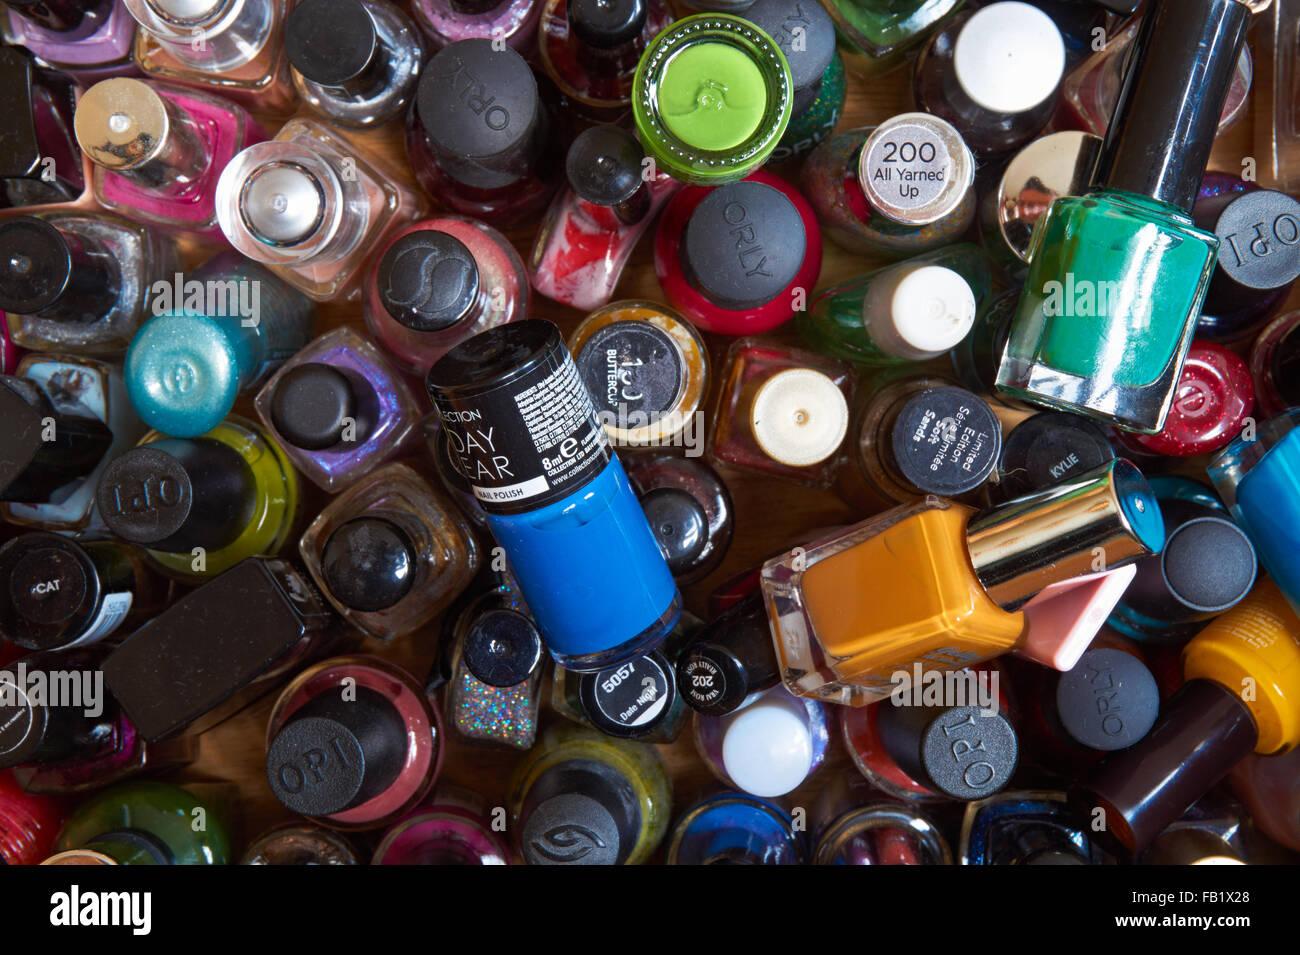 Nail varnish bottles - Stock Image